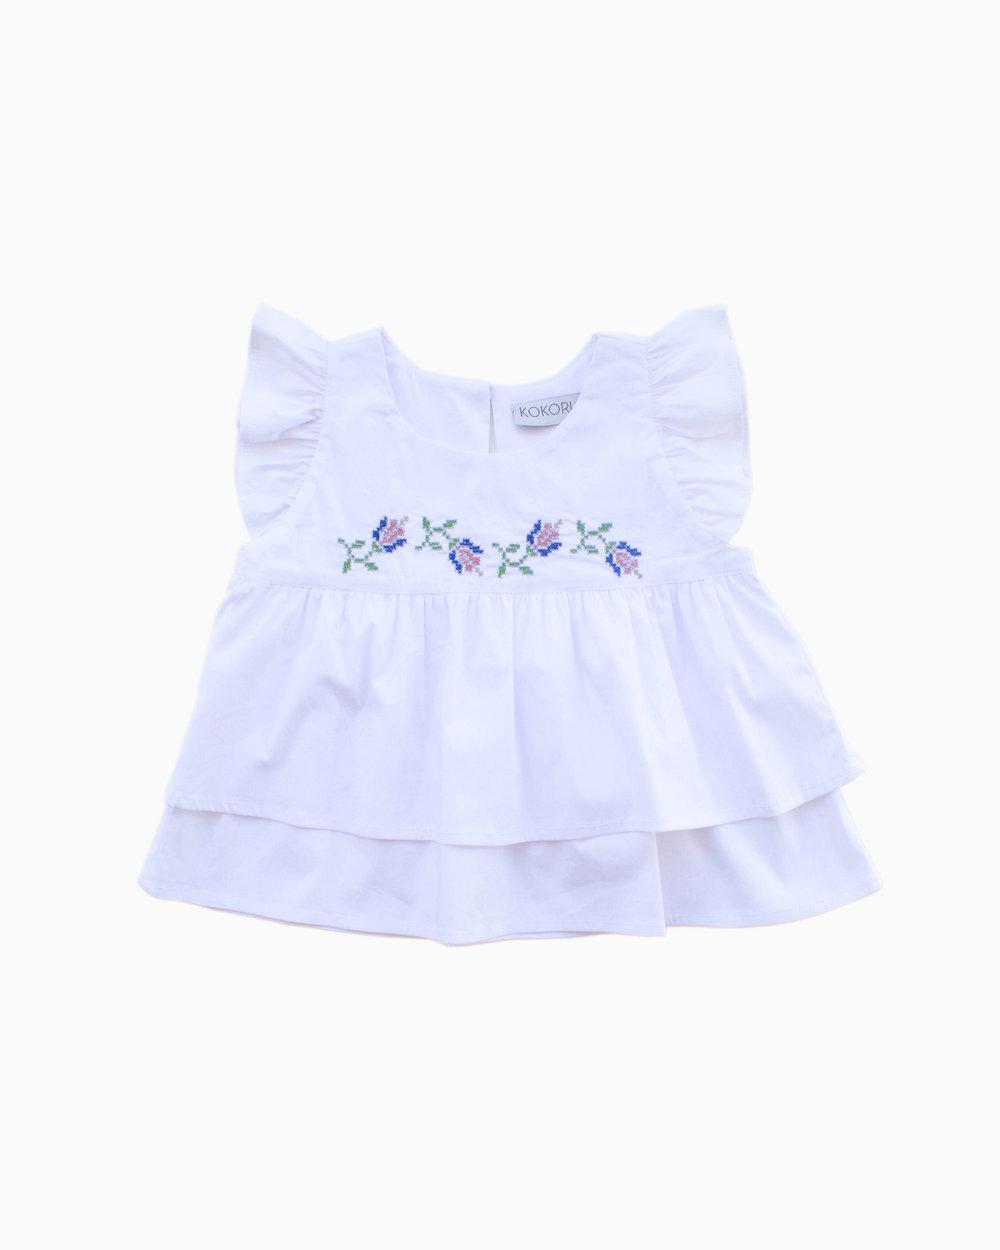 santorini blouse